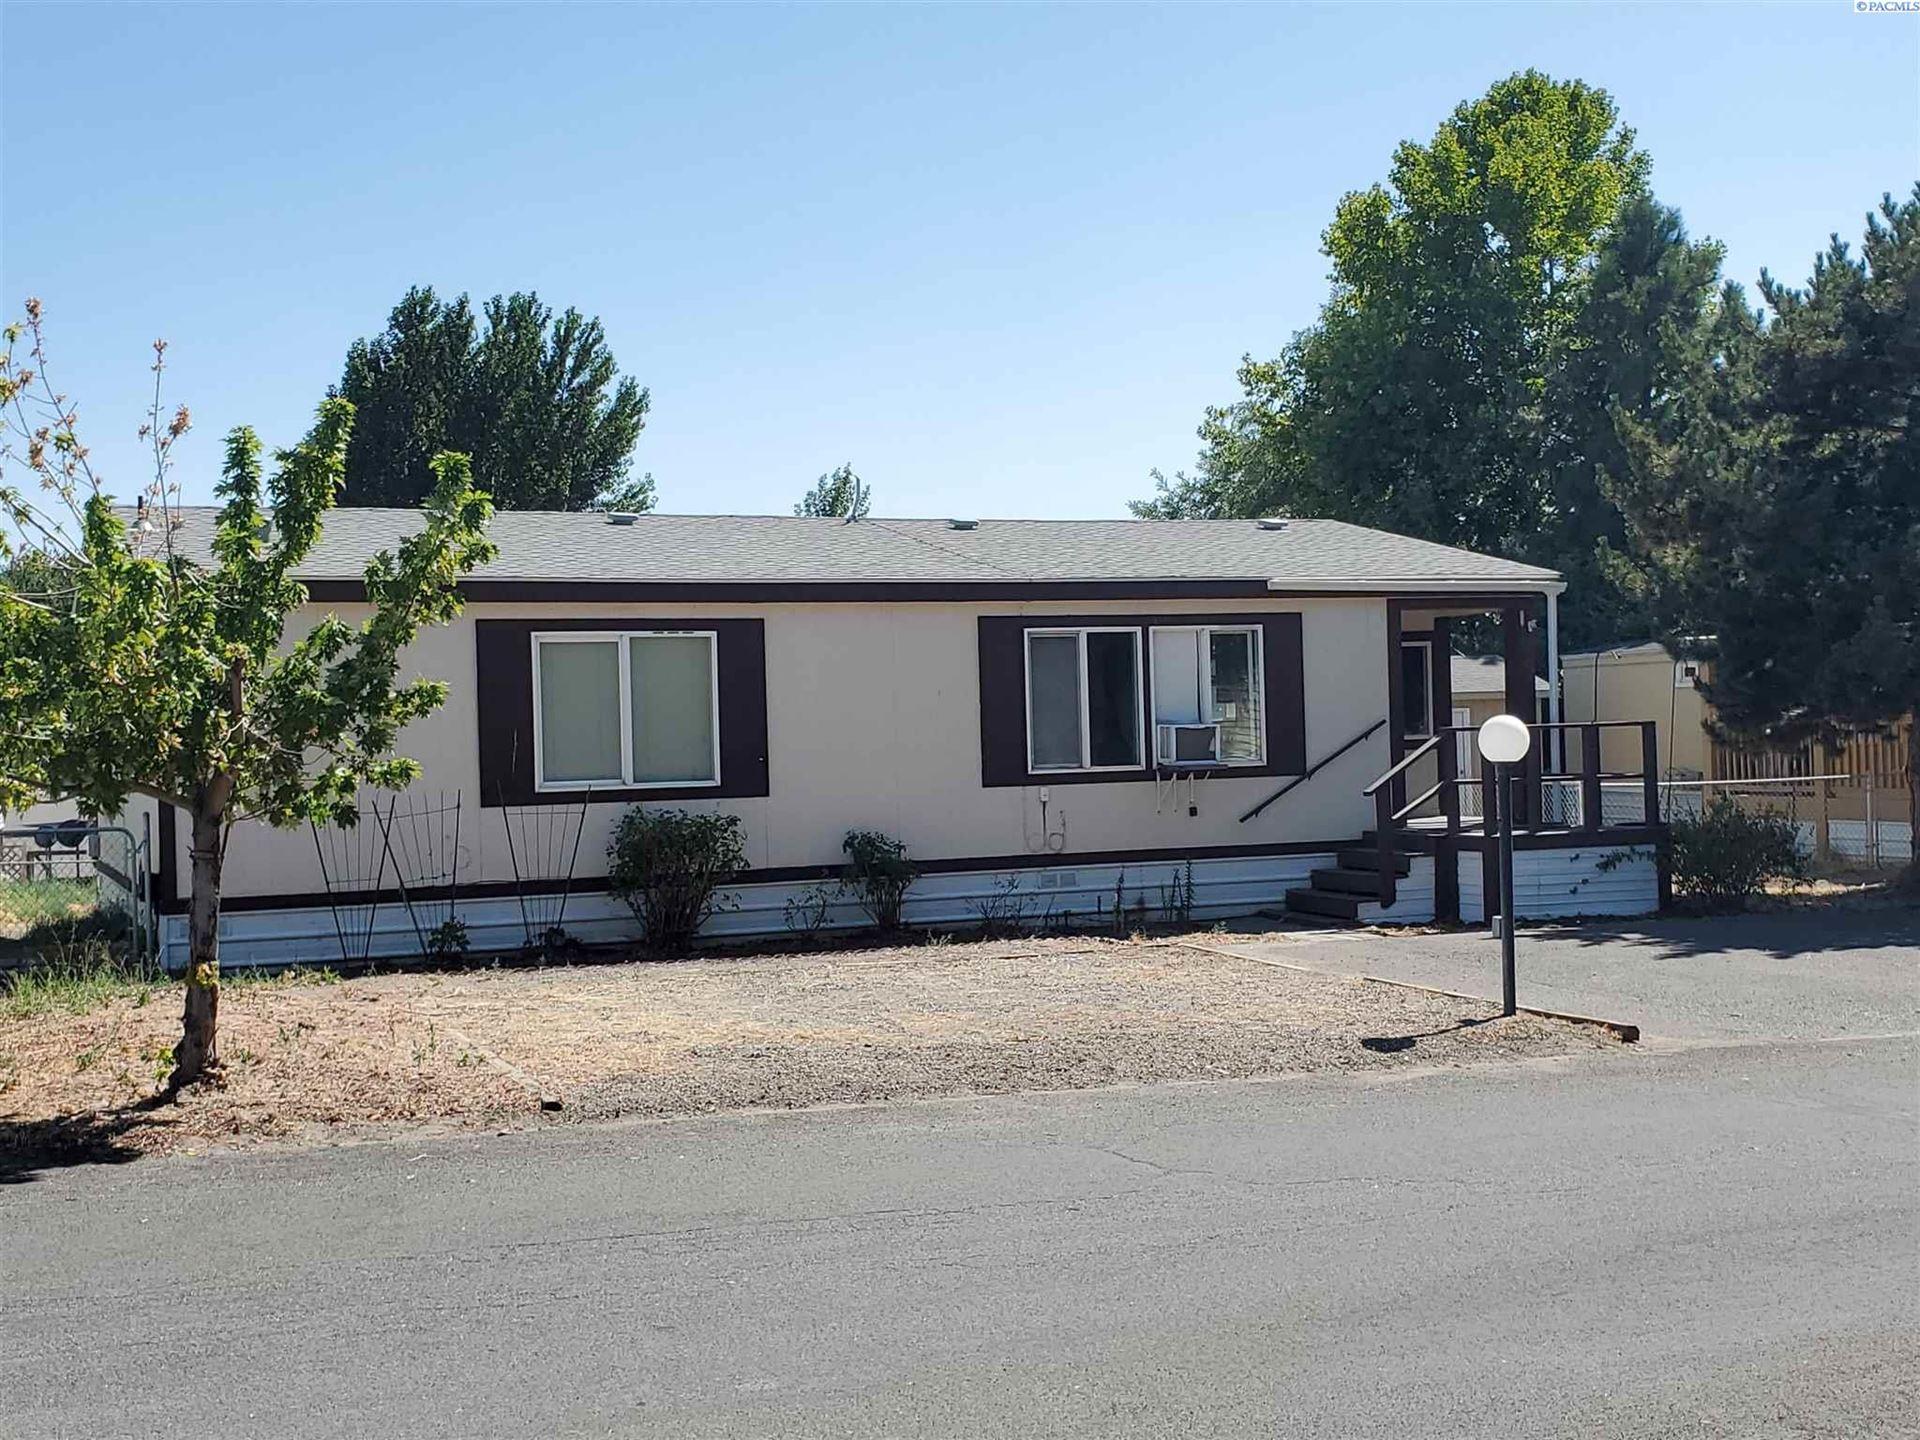 Photo of 6707 Morrison St, West Richland, WA 99353 (MLS # 255372)